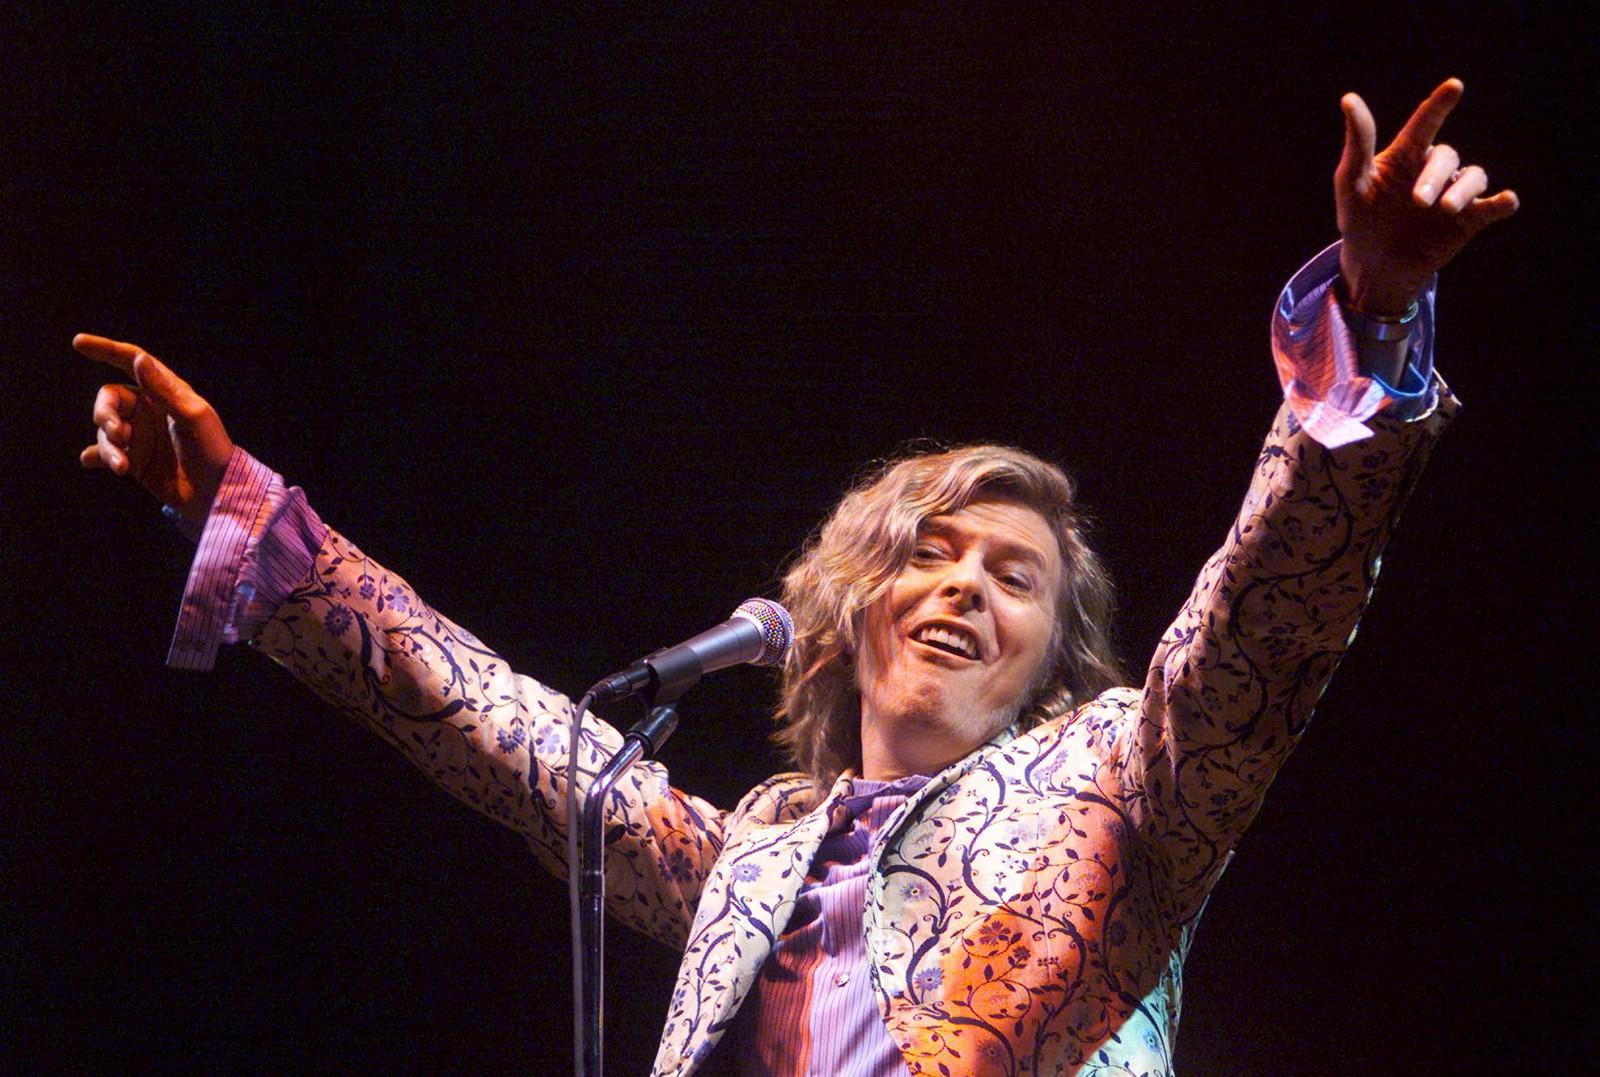 Her er Bowie headline på Glastonbury Festival i England i juni 2000.